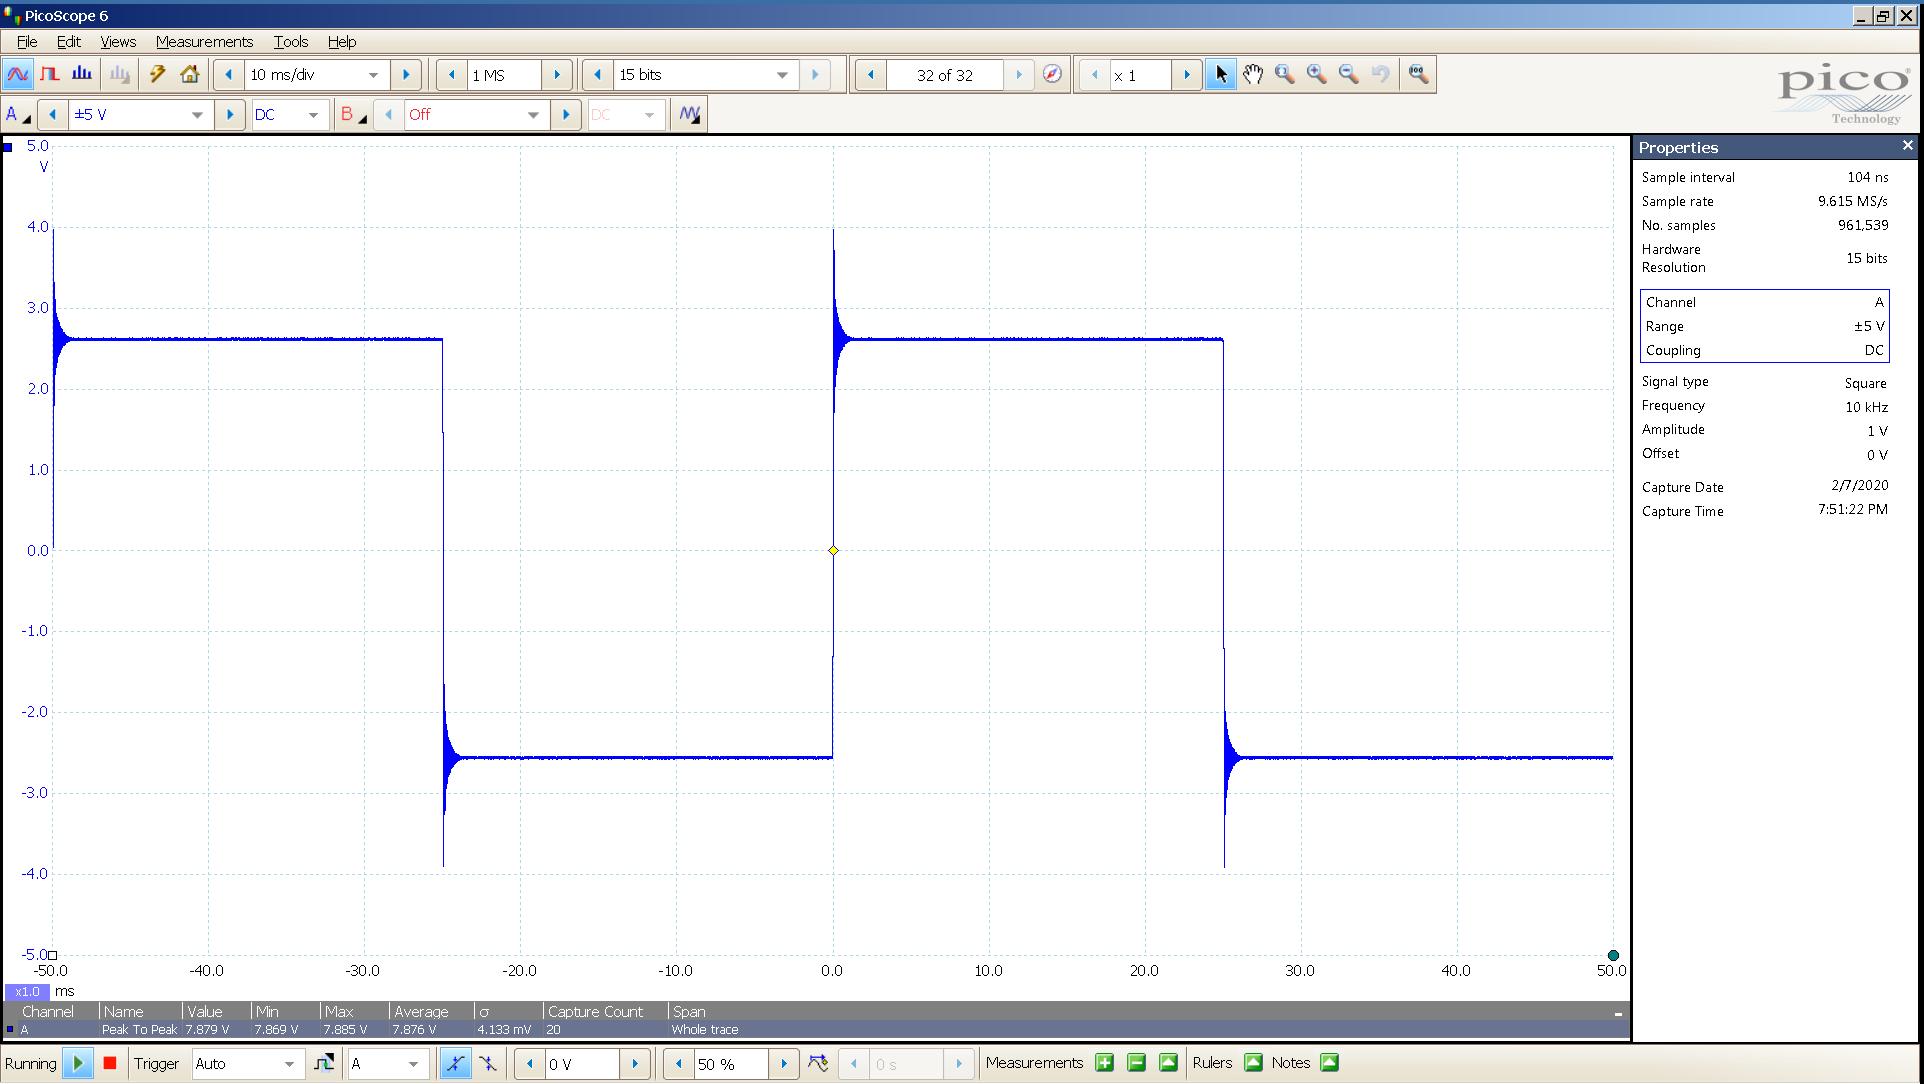 20200207-02 KTE May 20 Hz sqr -4 dBFS 5 Vpp 10mS div SE - ASIO - OS.png